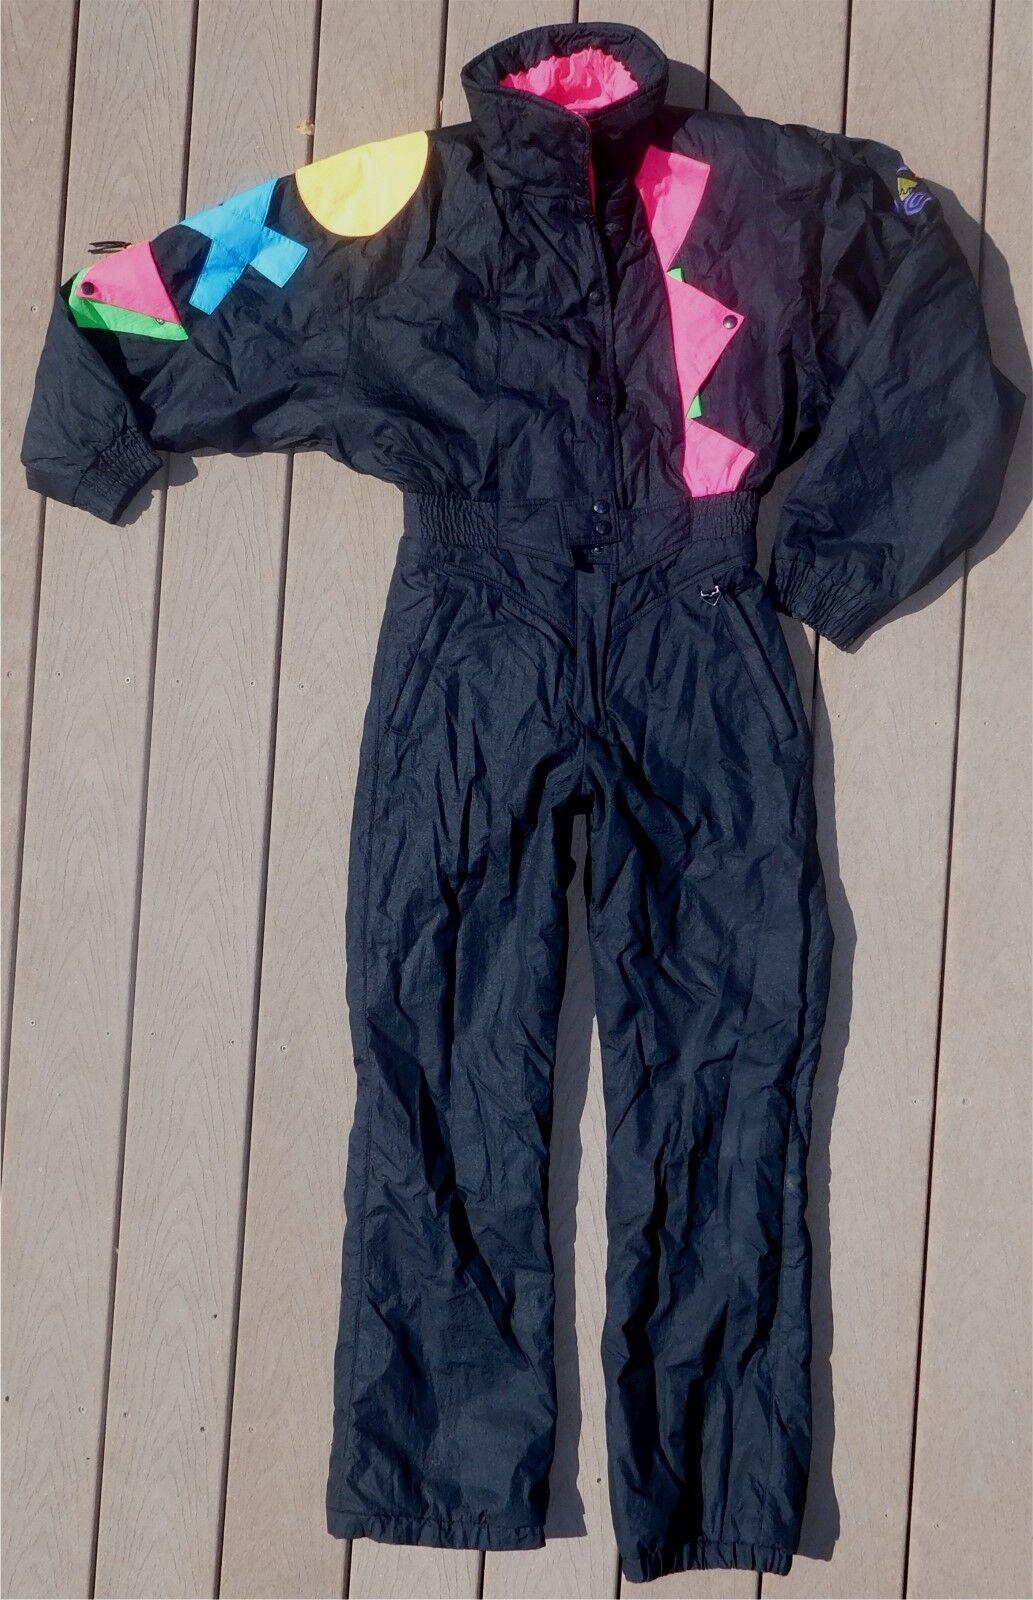 Women's Vintage OBERMEYER 90's Neon Ski Suit Snowsuit 1 Piece 12 Coat Pants